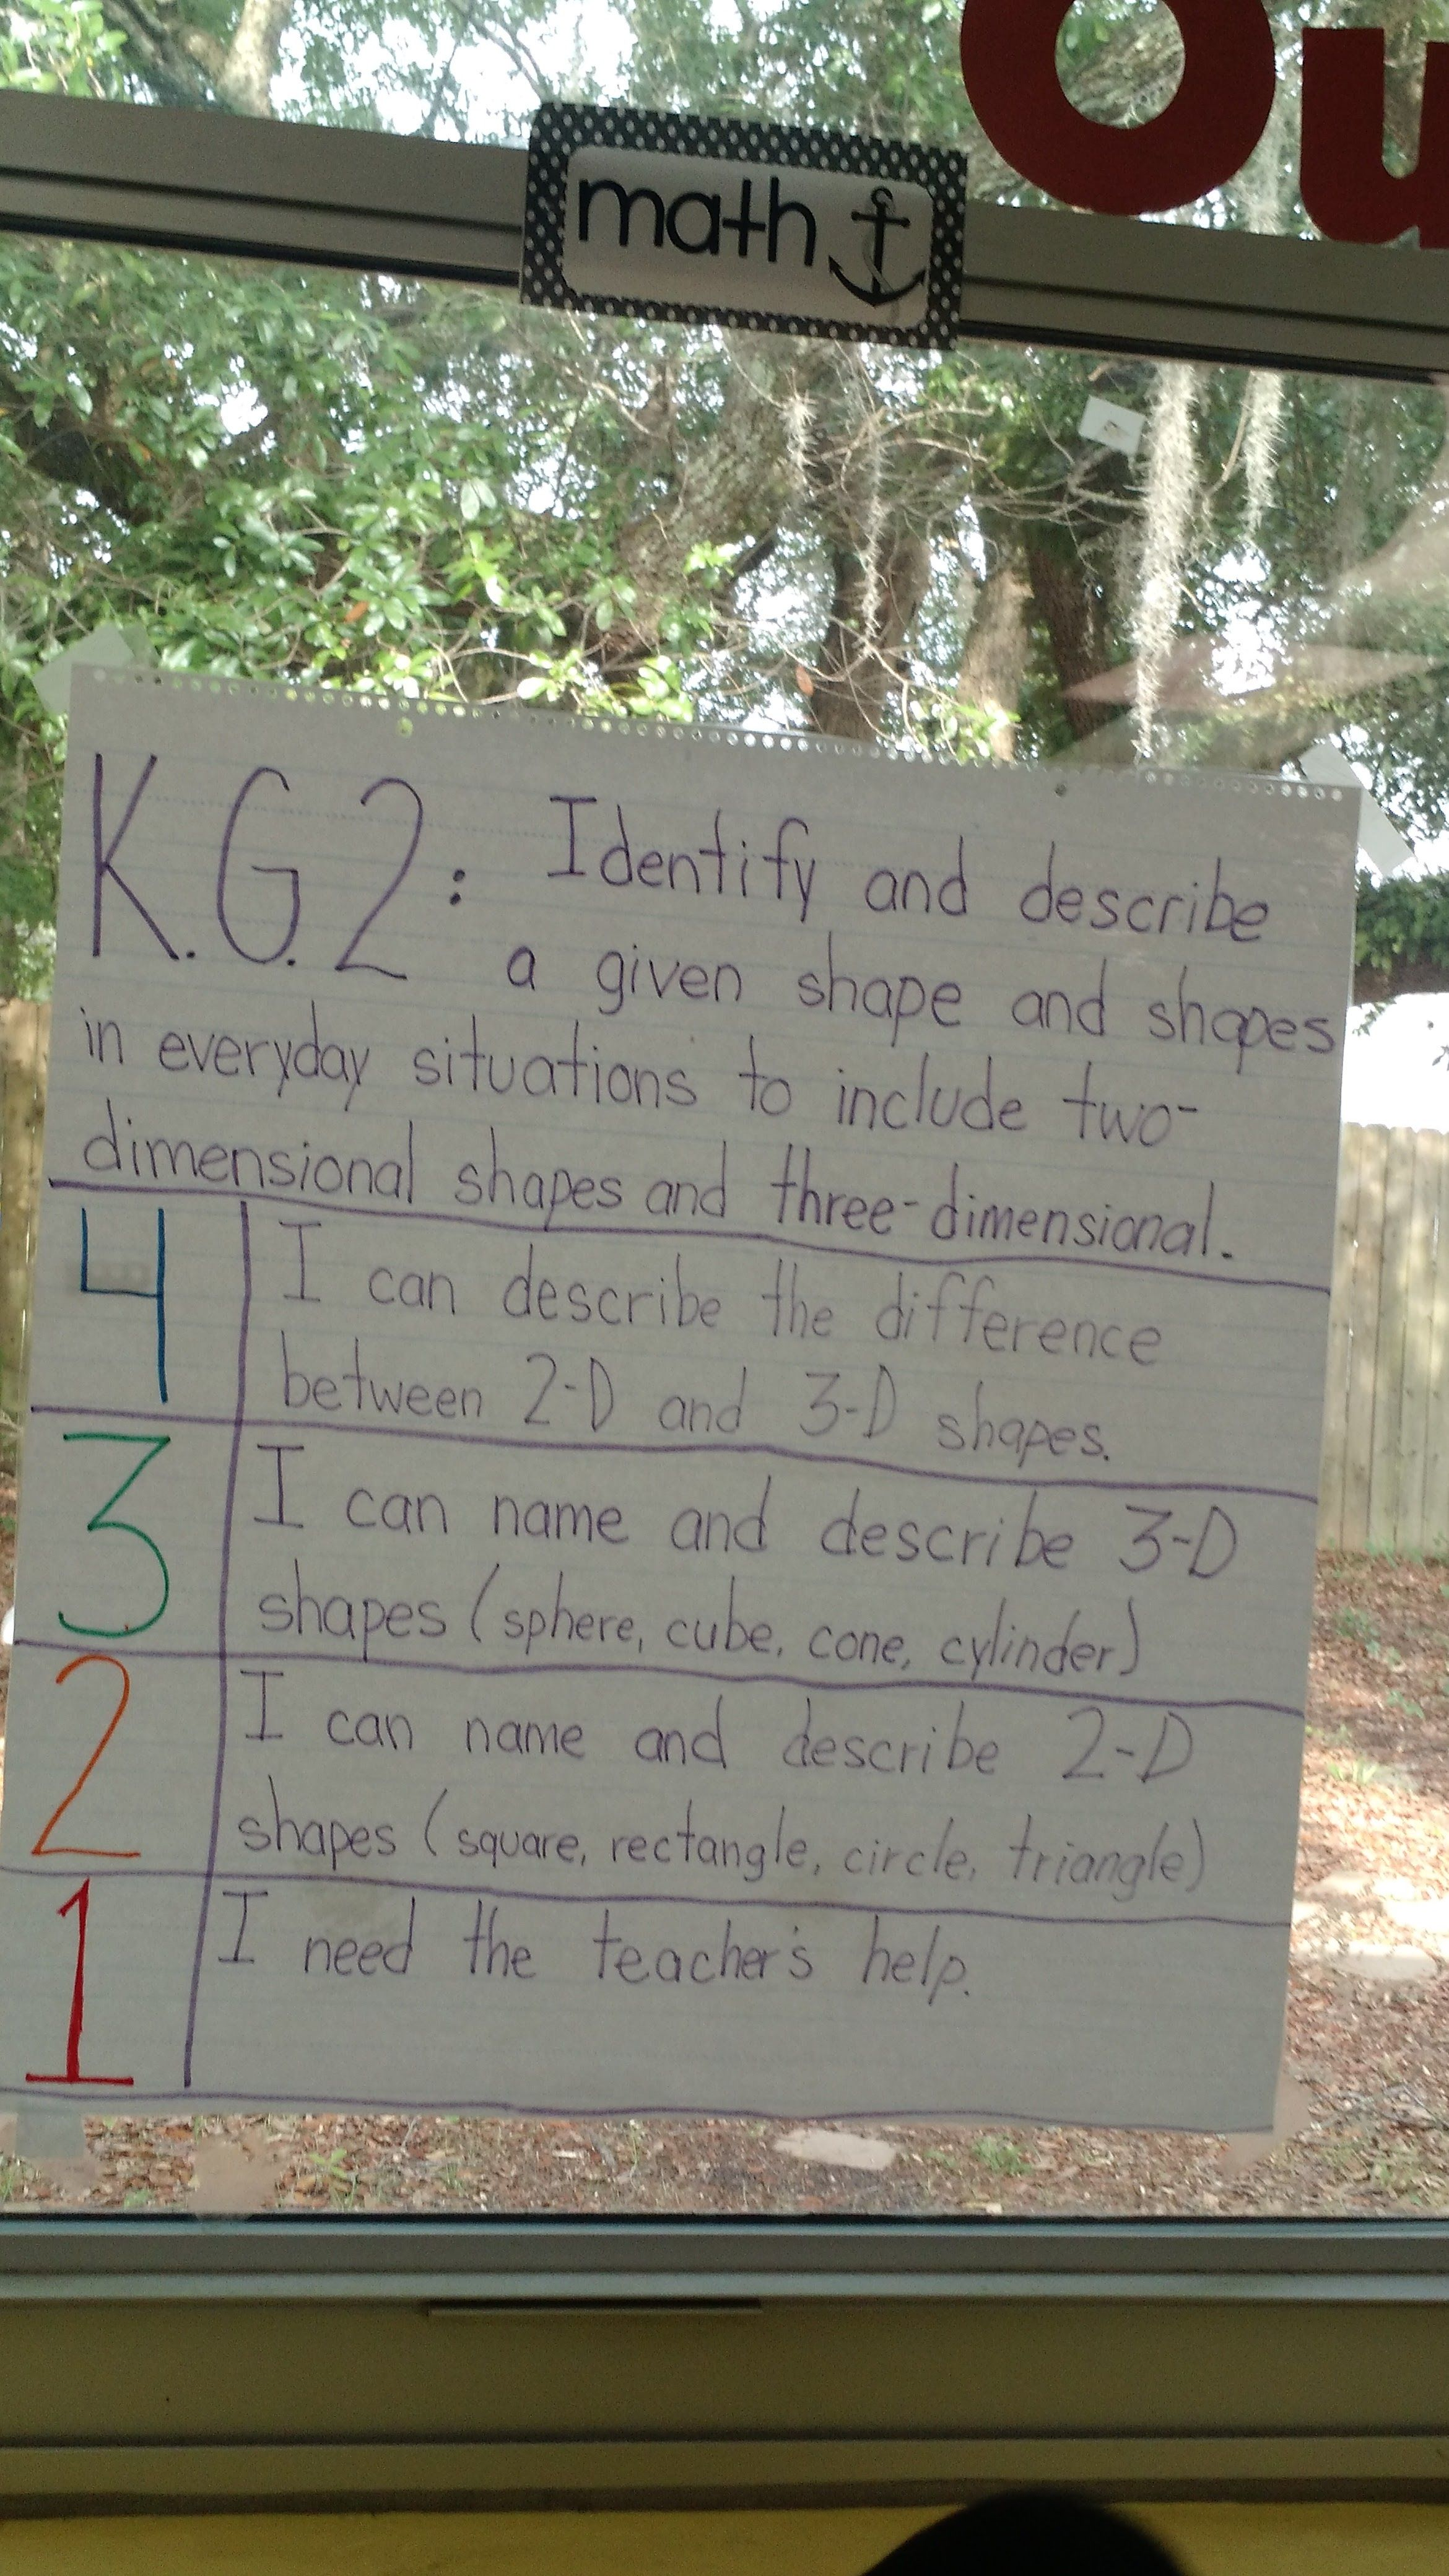 Kindergarten Proficiency Scale Progression Of Learning